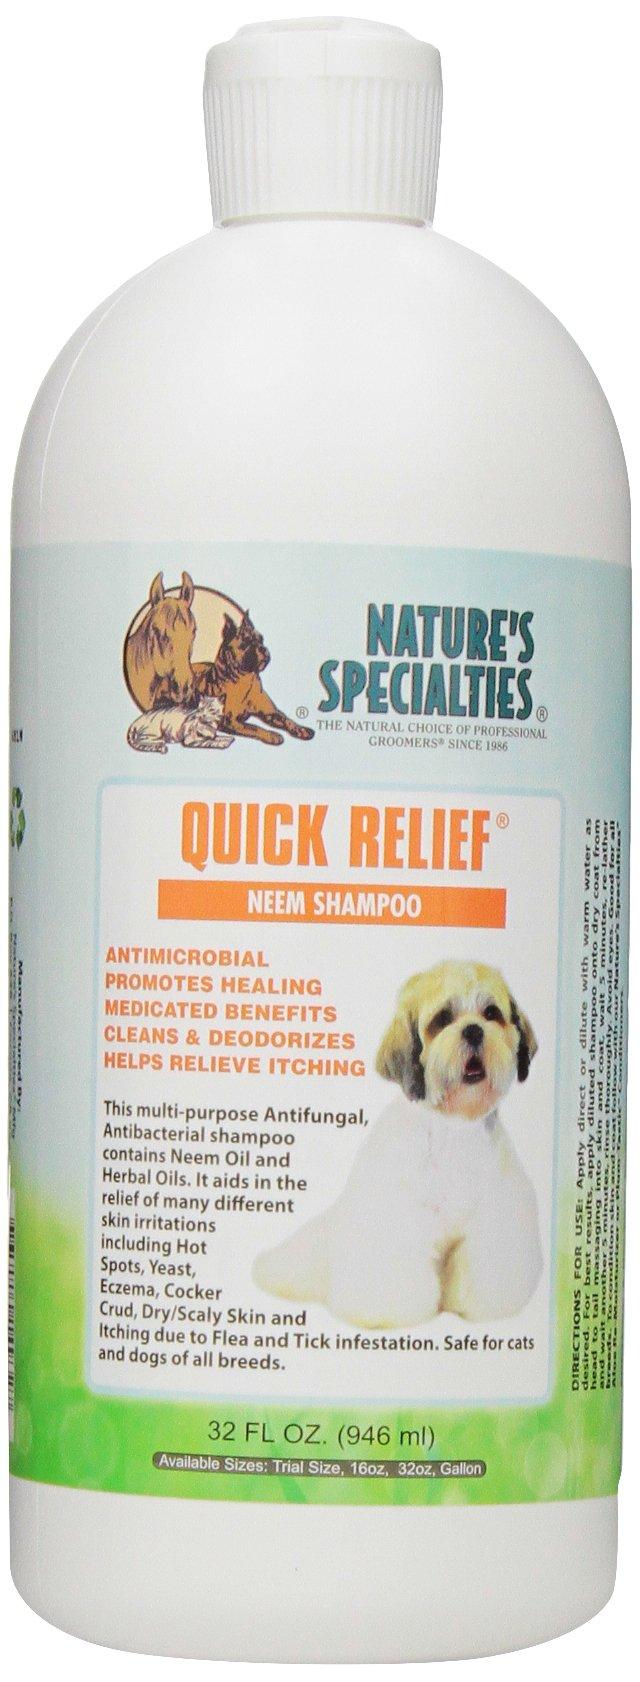 Nature's Specialties Quick Relief Neem Shampoo for Pets, 32-Ounce by Nature's Specialties Mfg